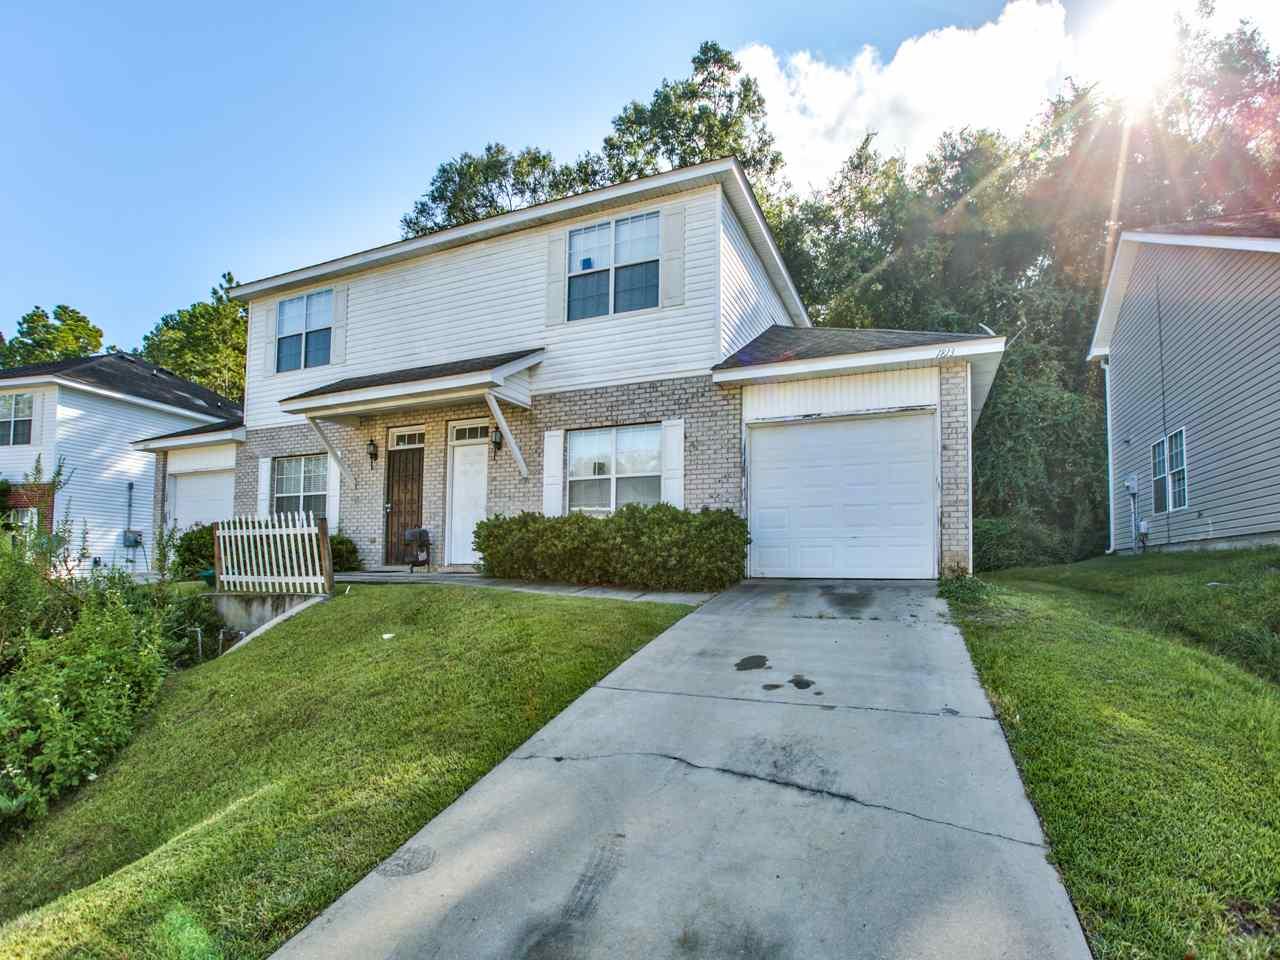 Photo of 1813 Nena Hills, Tallahassee, FL 32304